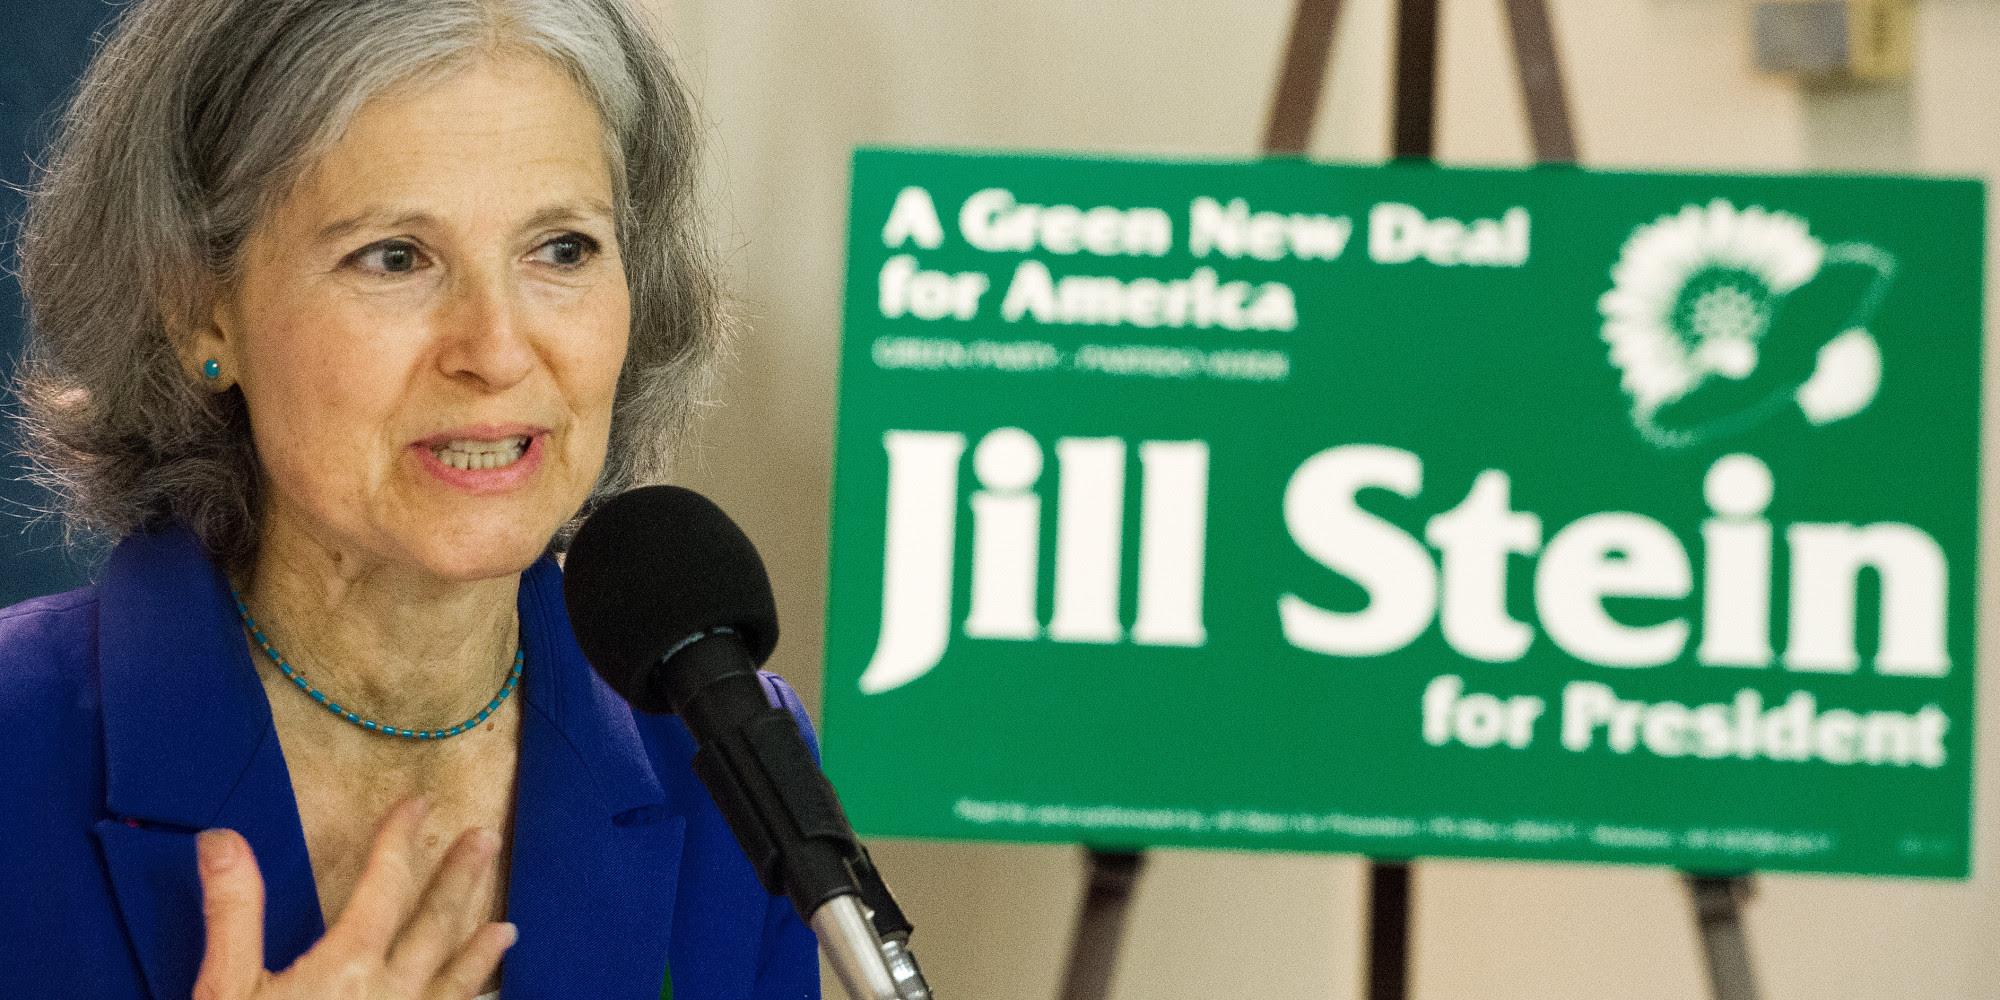 US Green Party leader Jill Stein